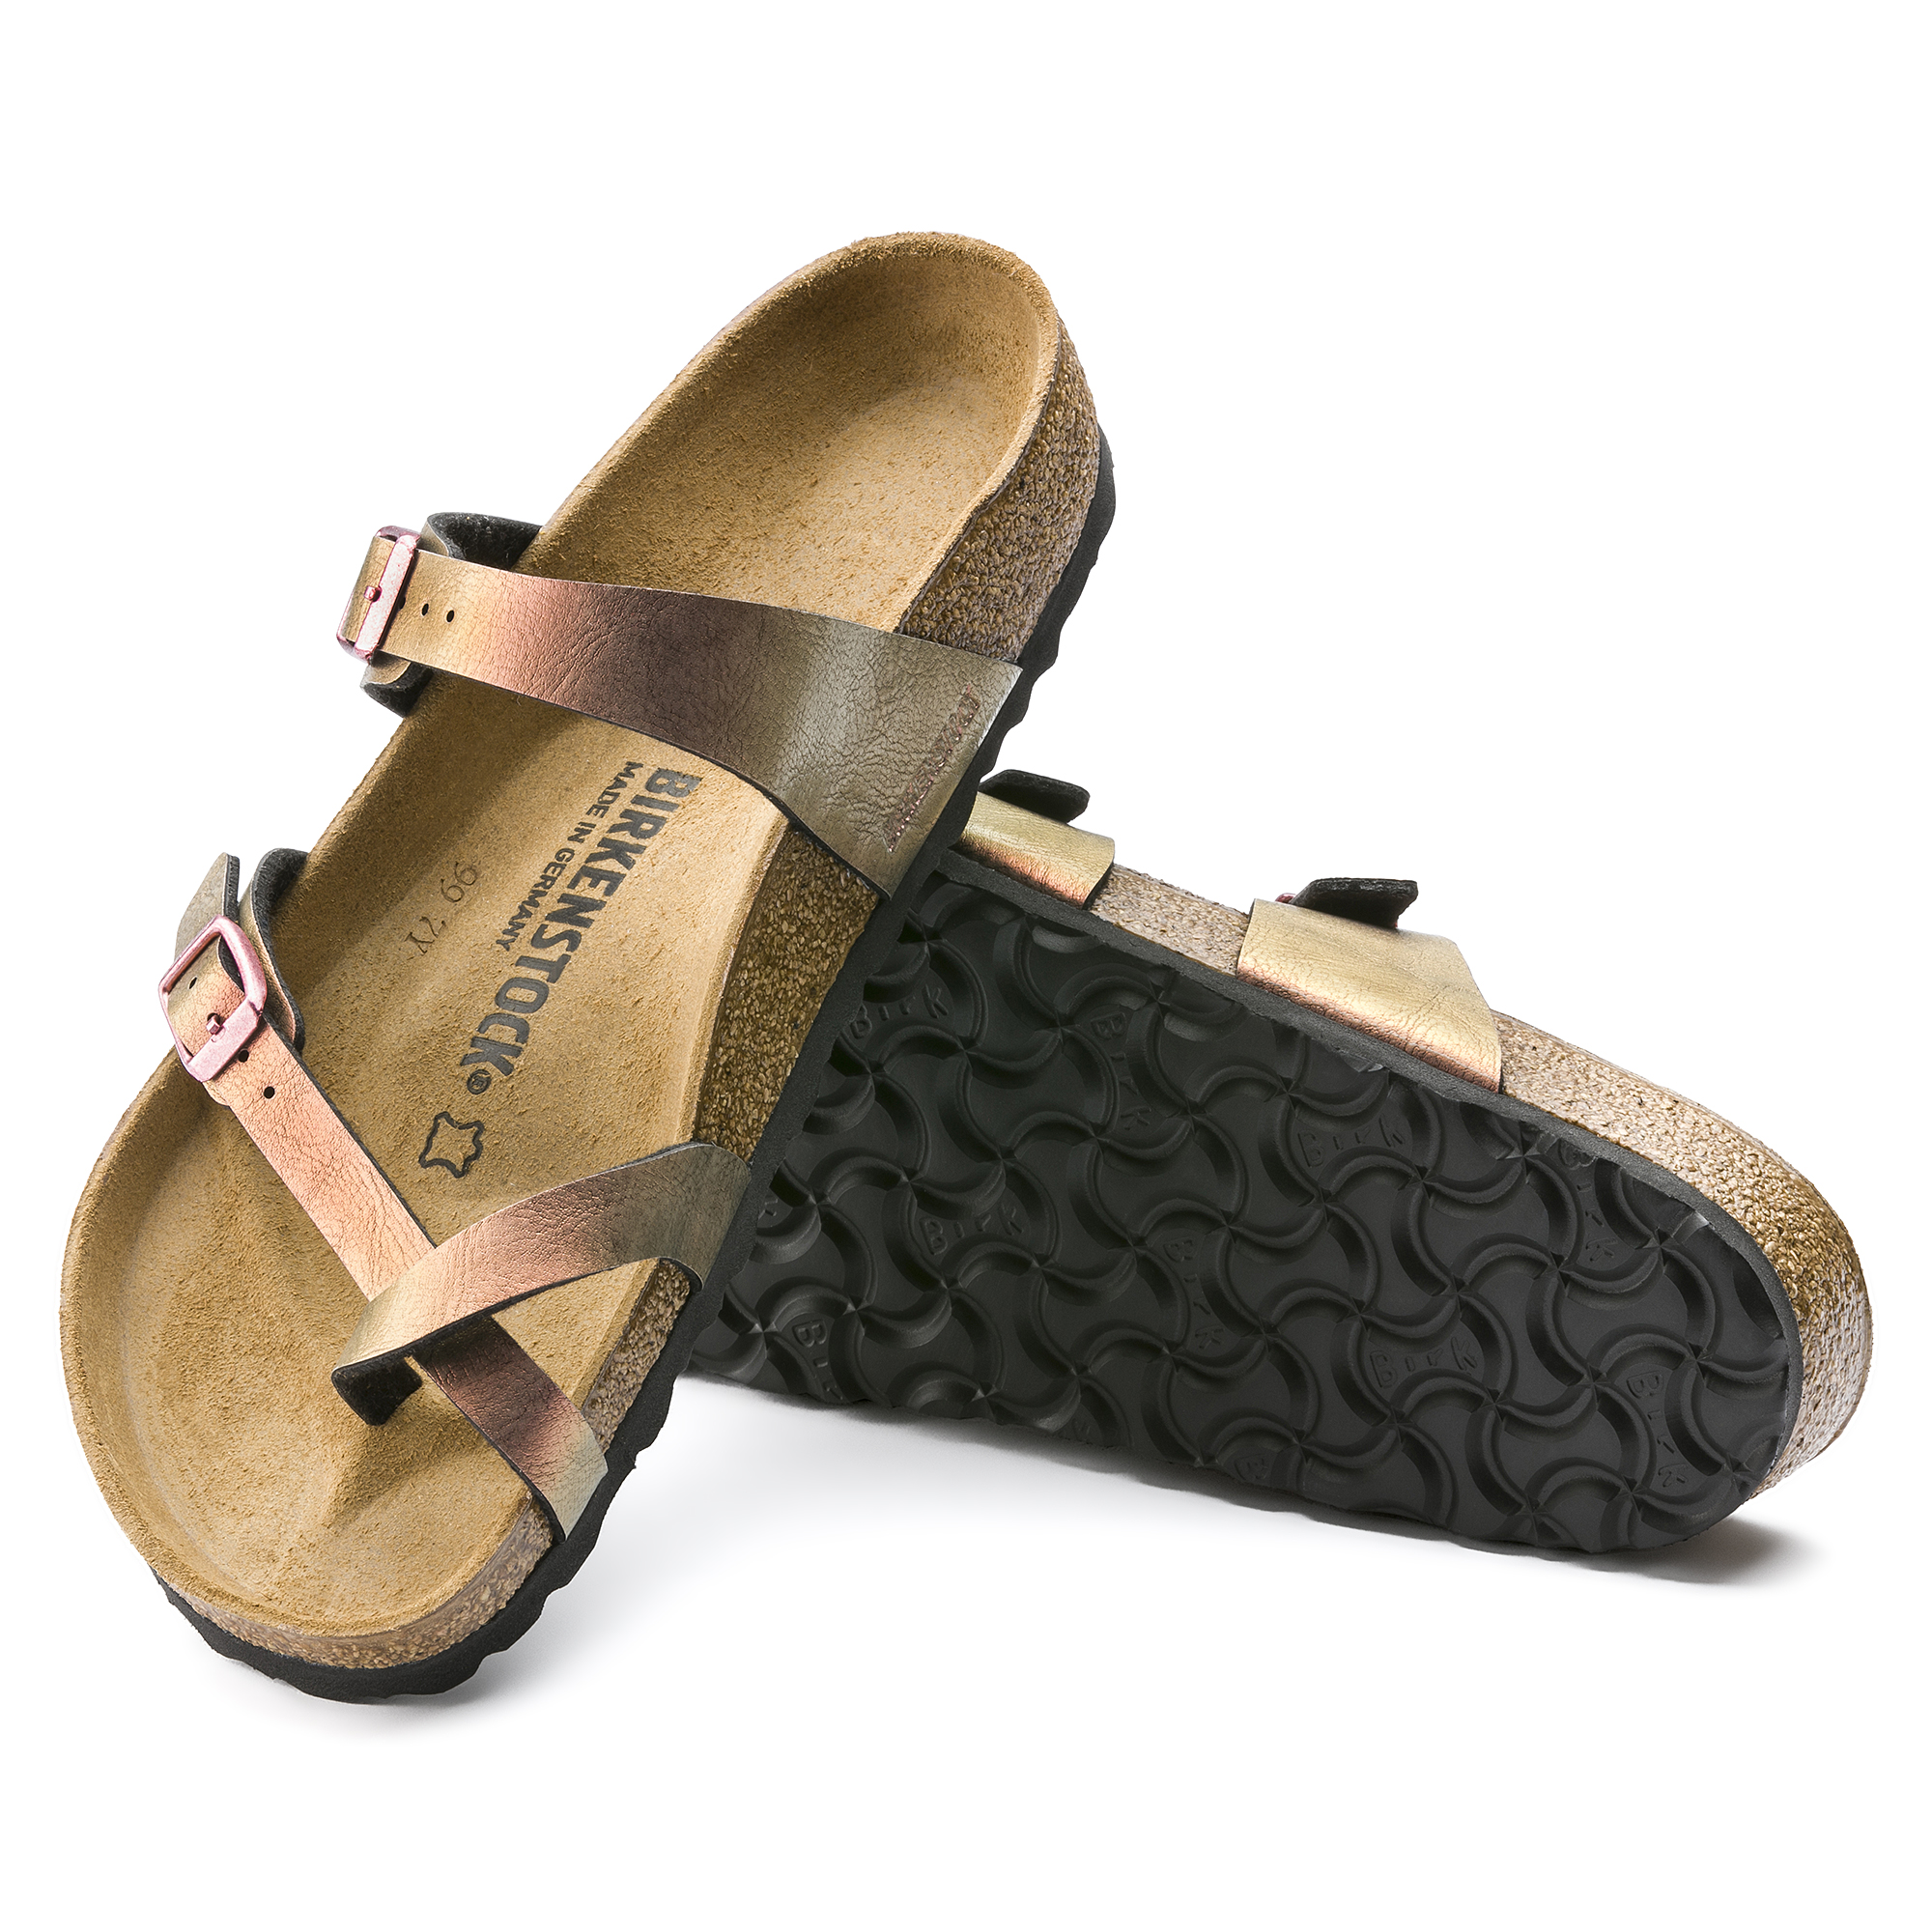 Birkenstock New Women's Mayari Sandal Graceful Gem Violet 37